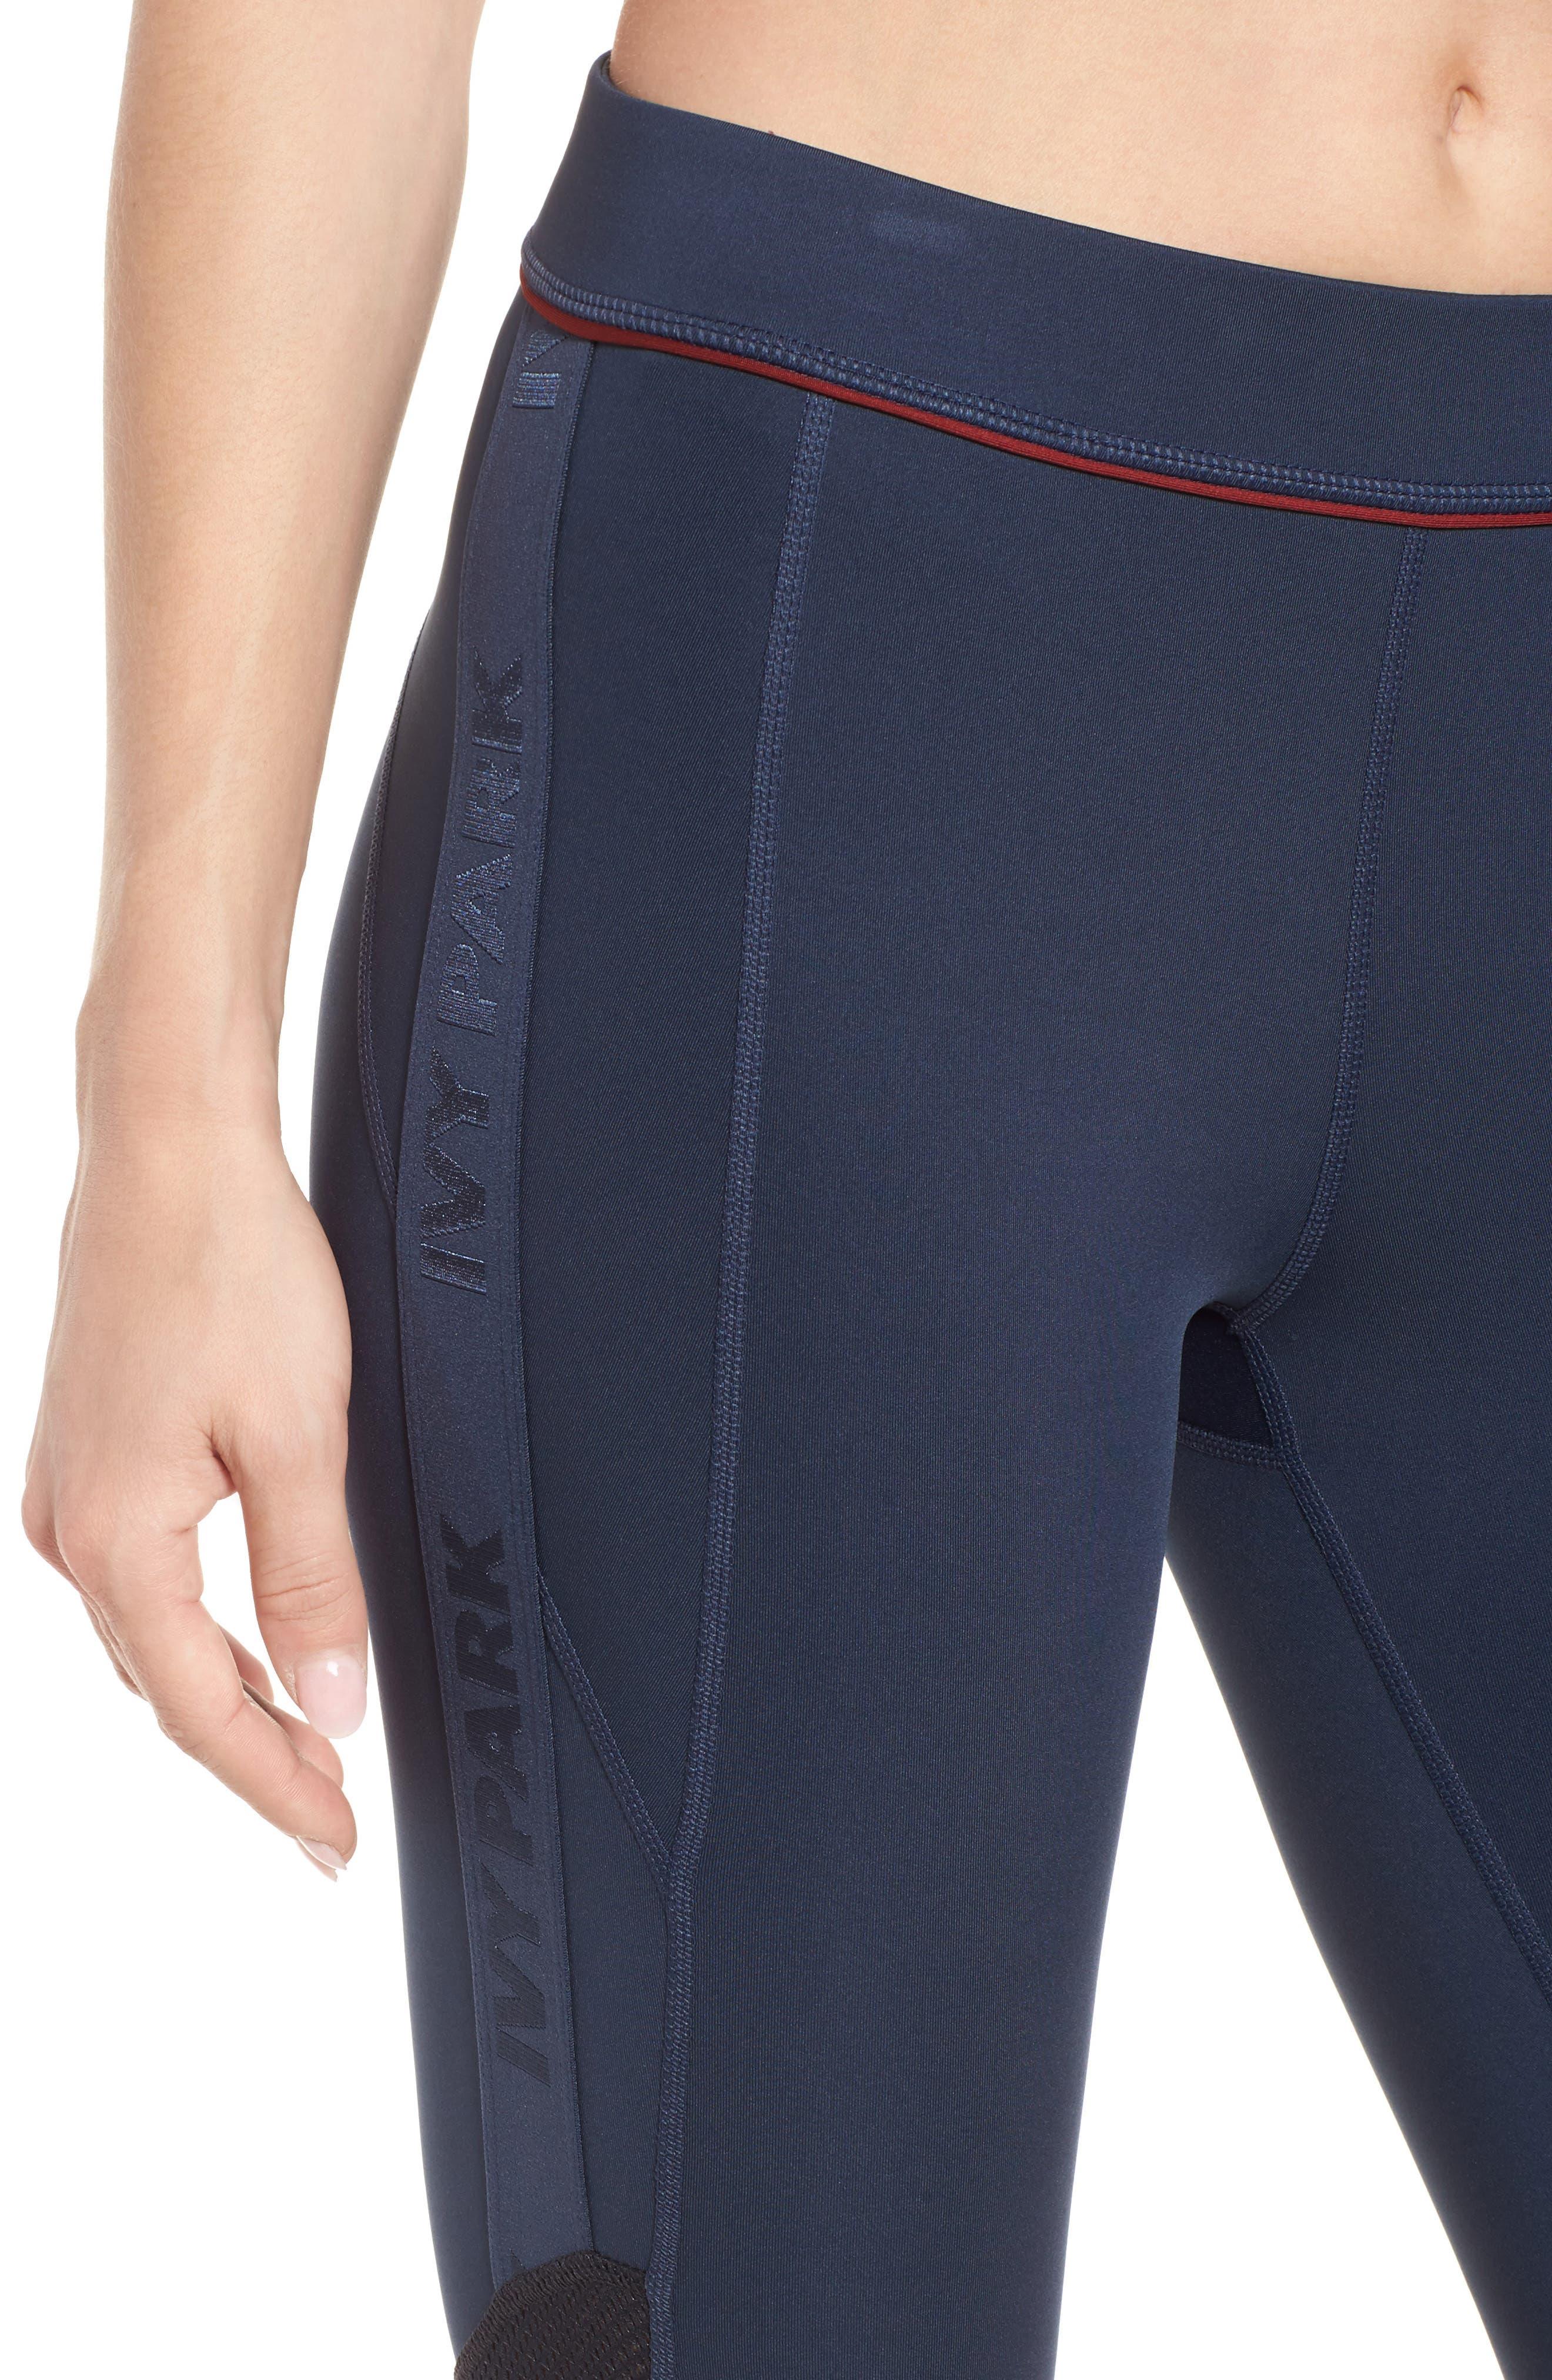 Alternate Image 4  - IVY PARK® Logo Elastic Leggings